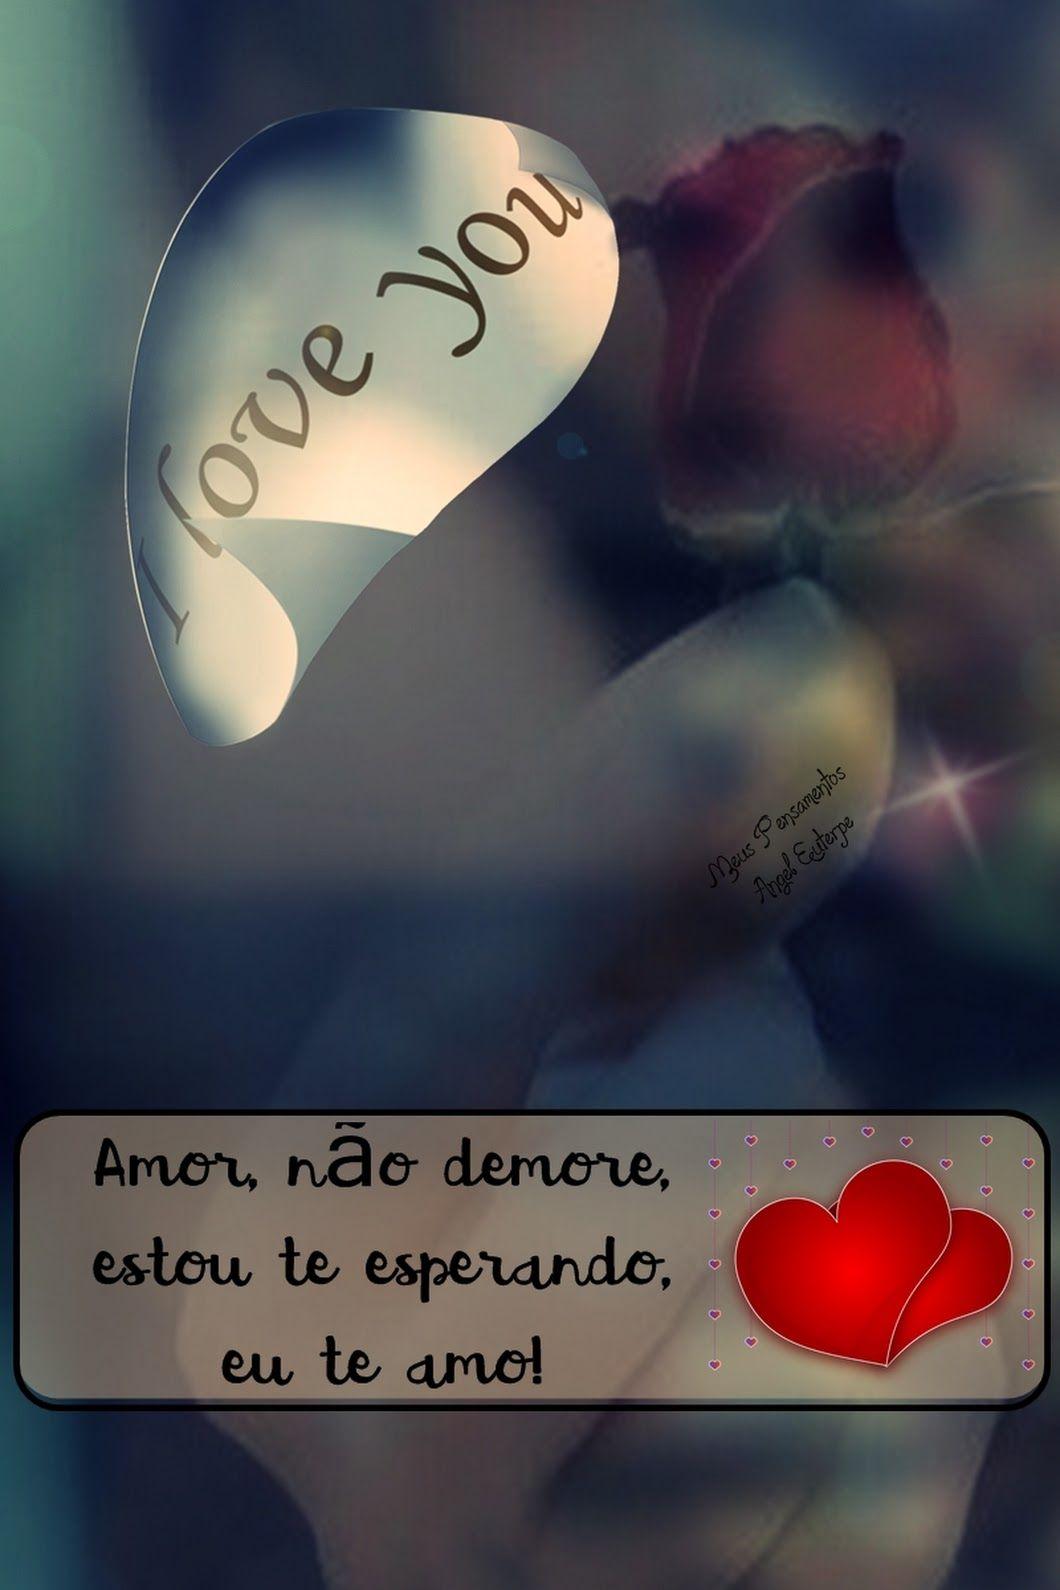 Louco Pra Te Ver Lytmttmabit Mensagens De Amor Frases